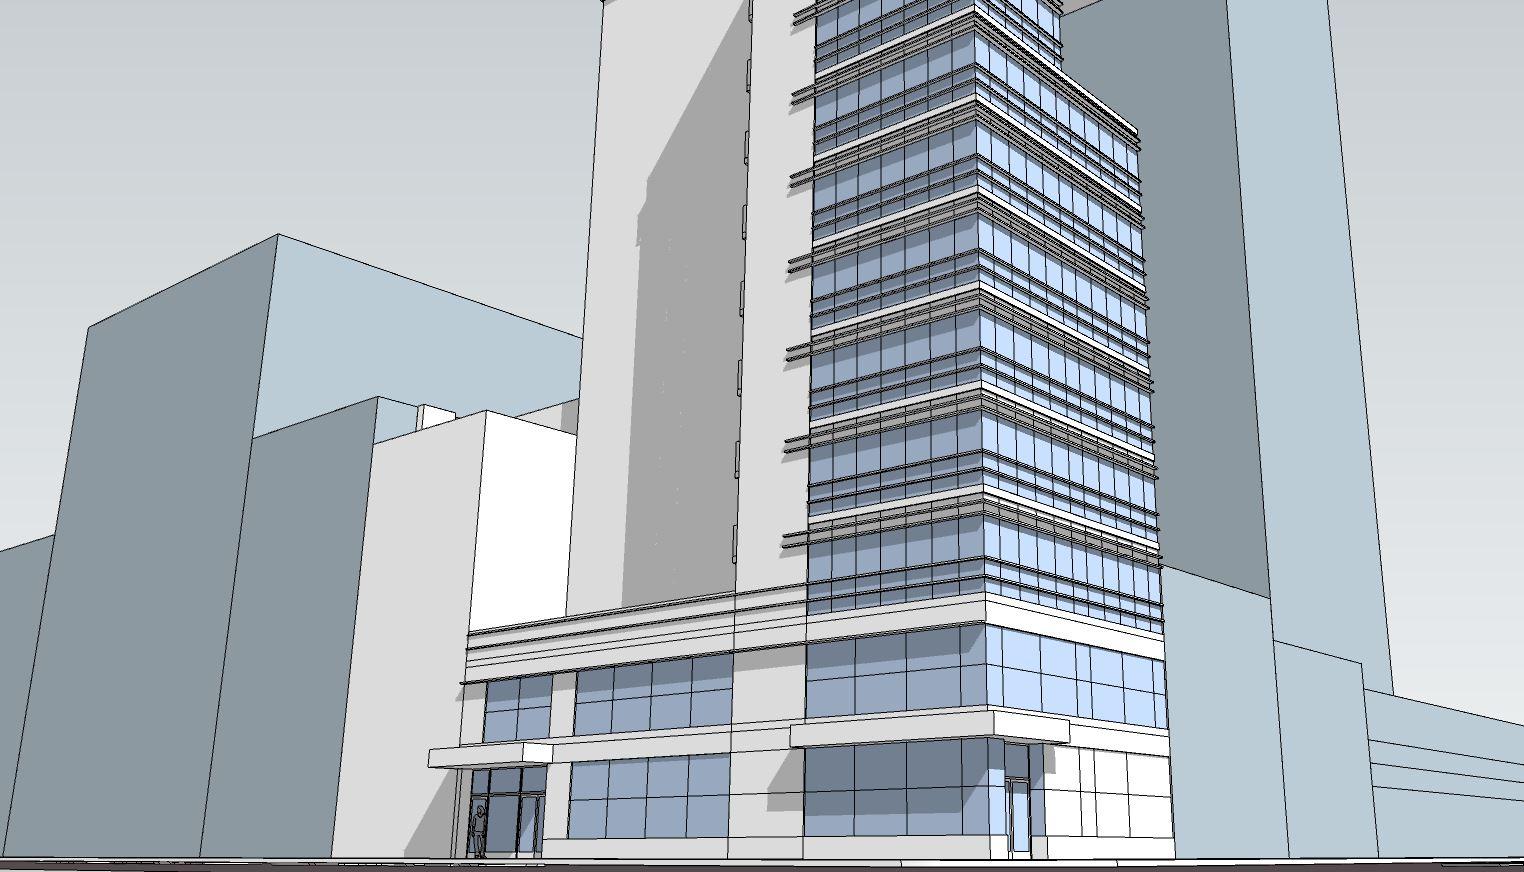 86 Delancey Street. Drawing via SWA Architecture.